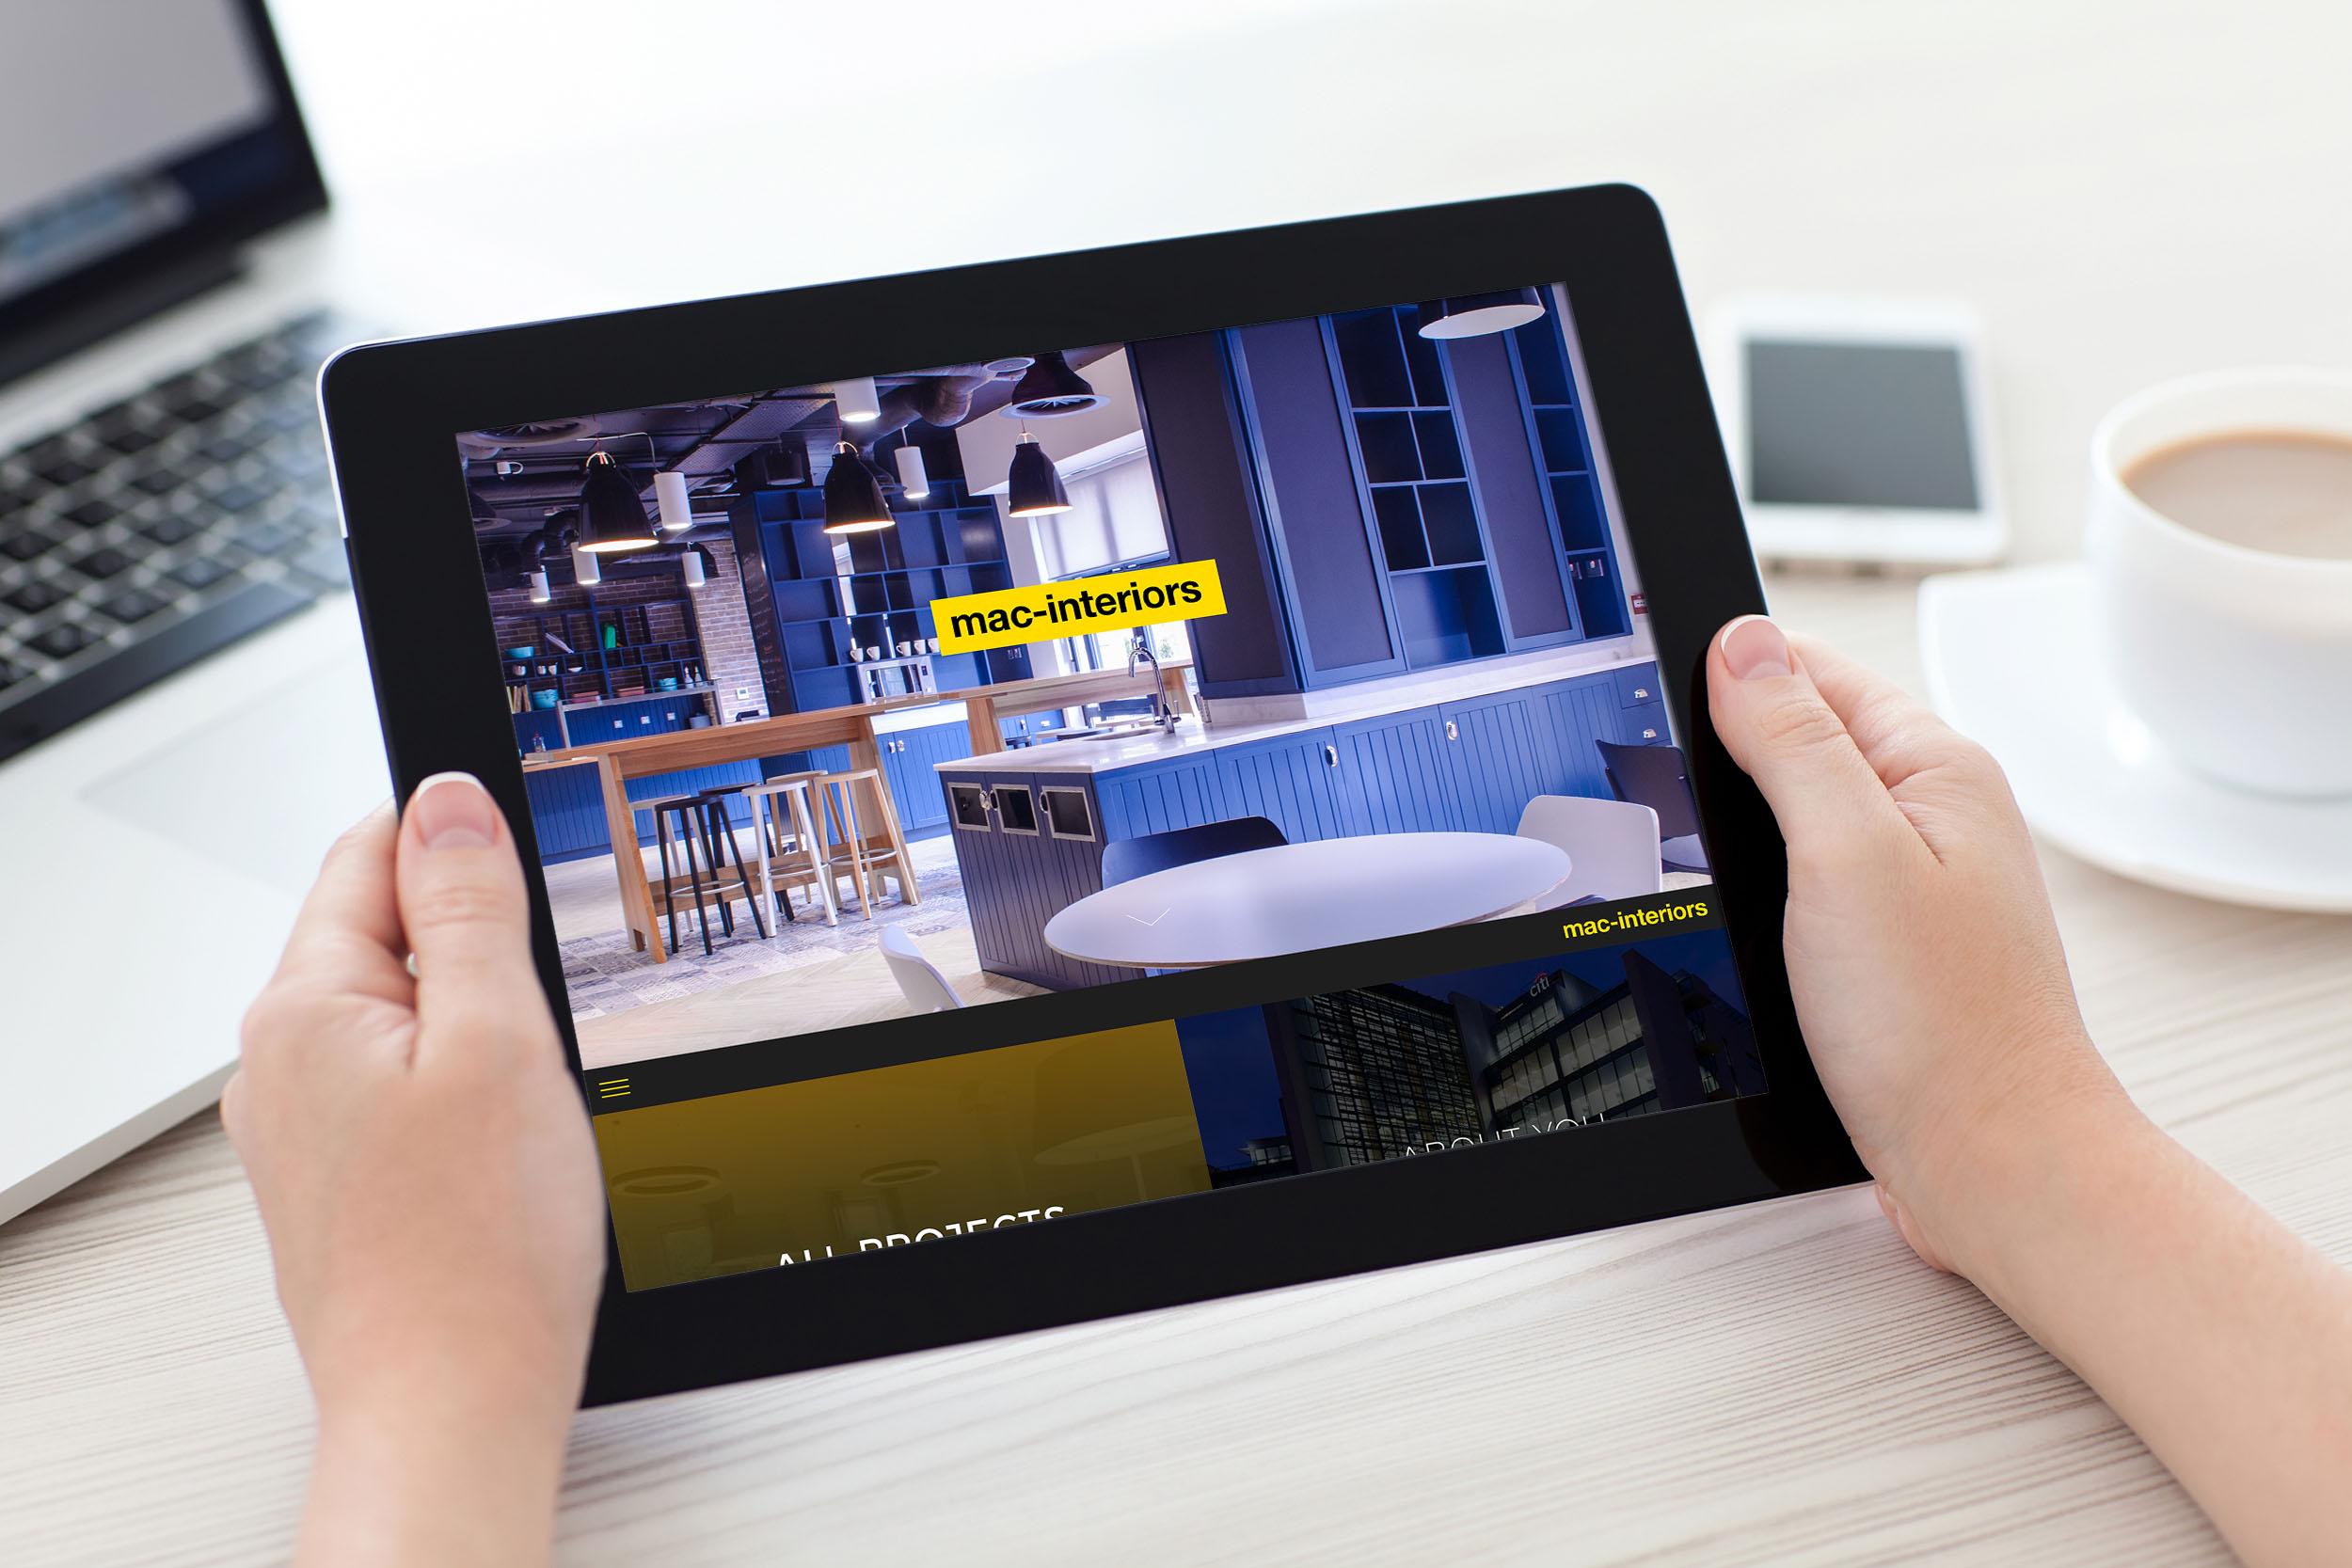 Cover image: mac-interiors website